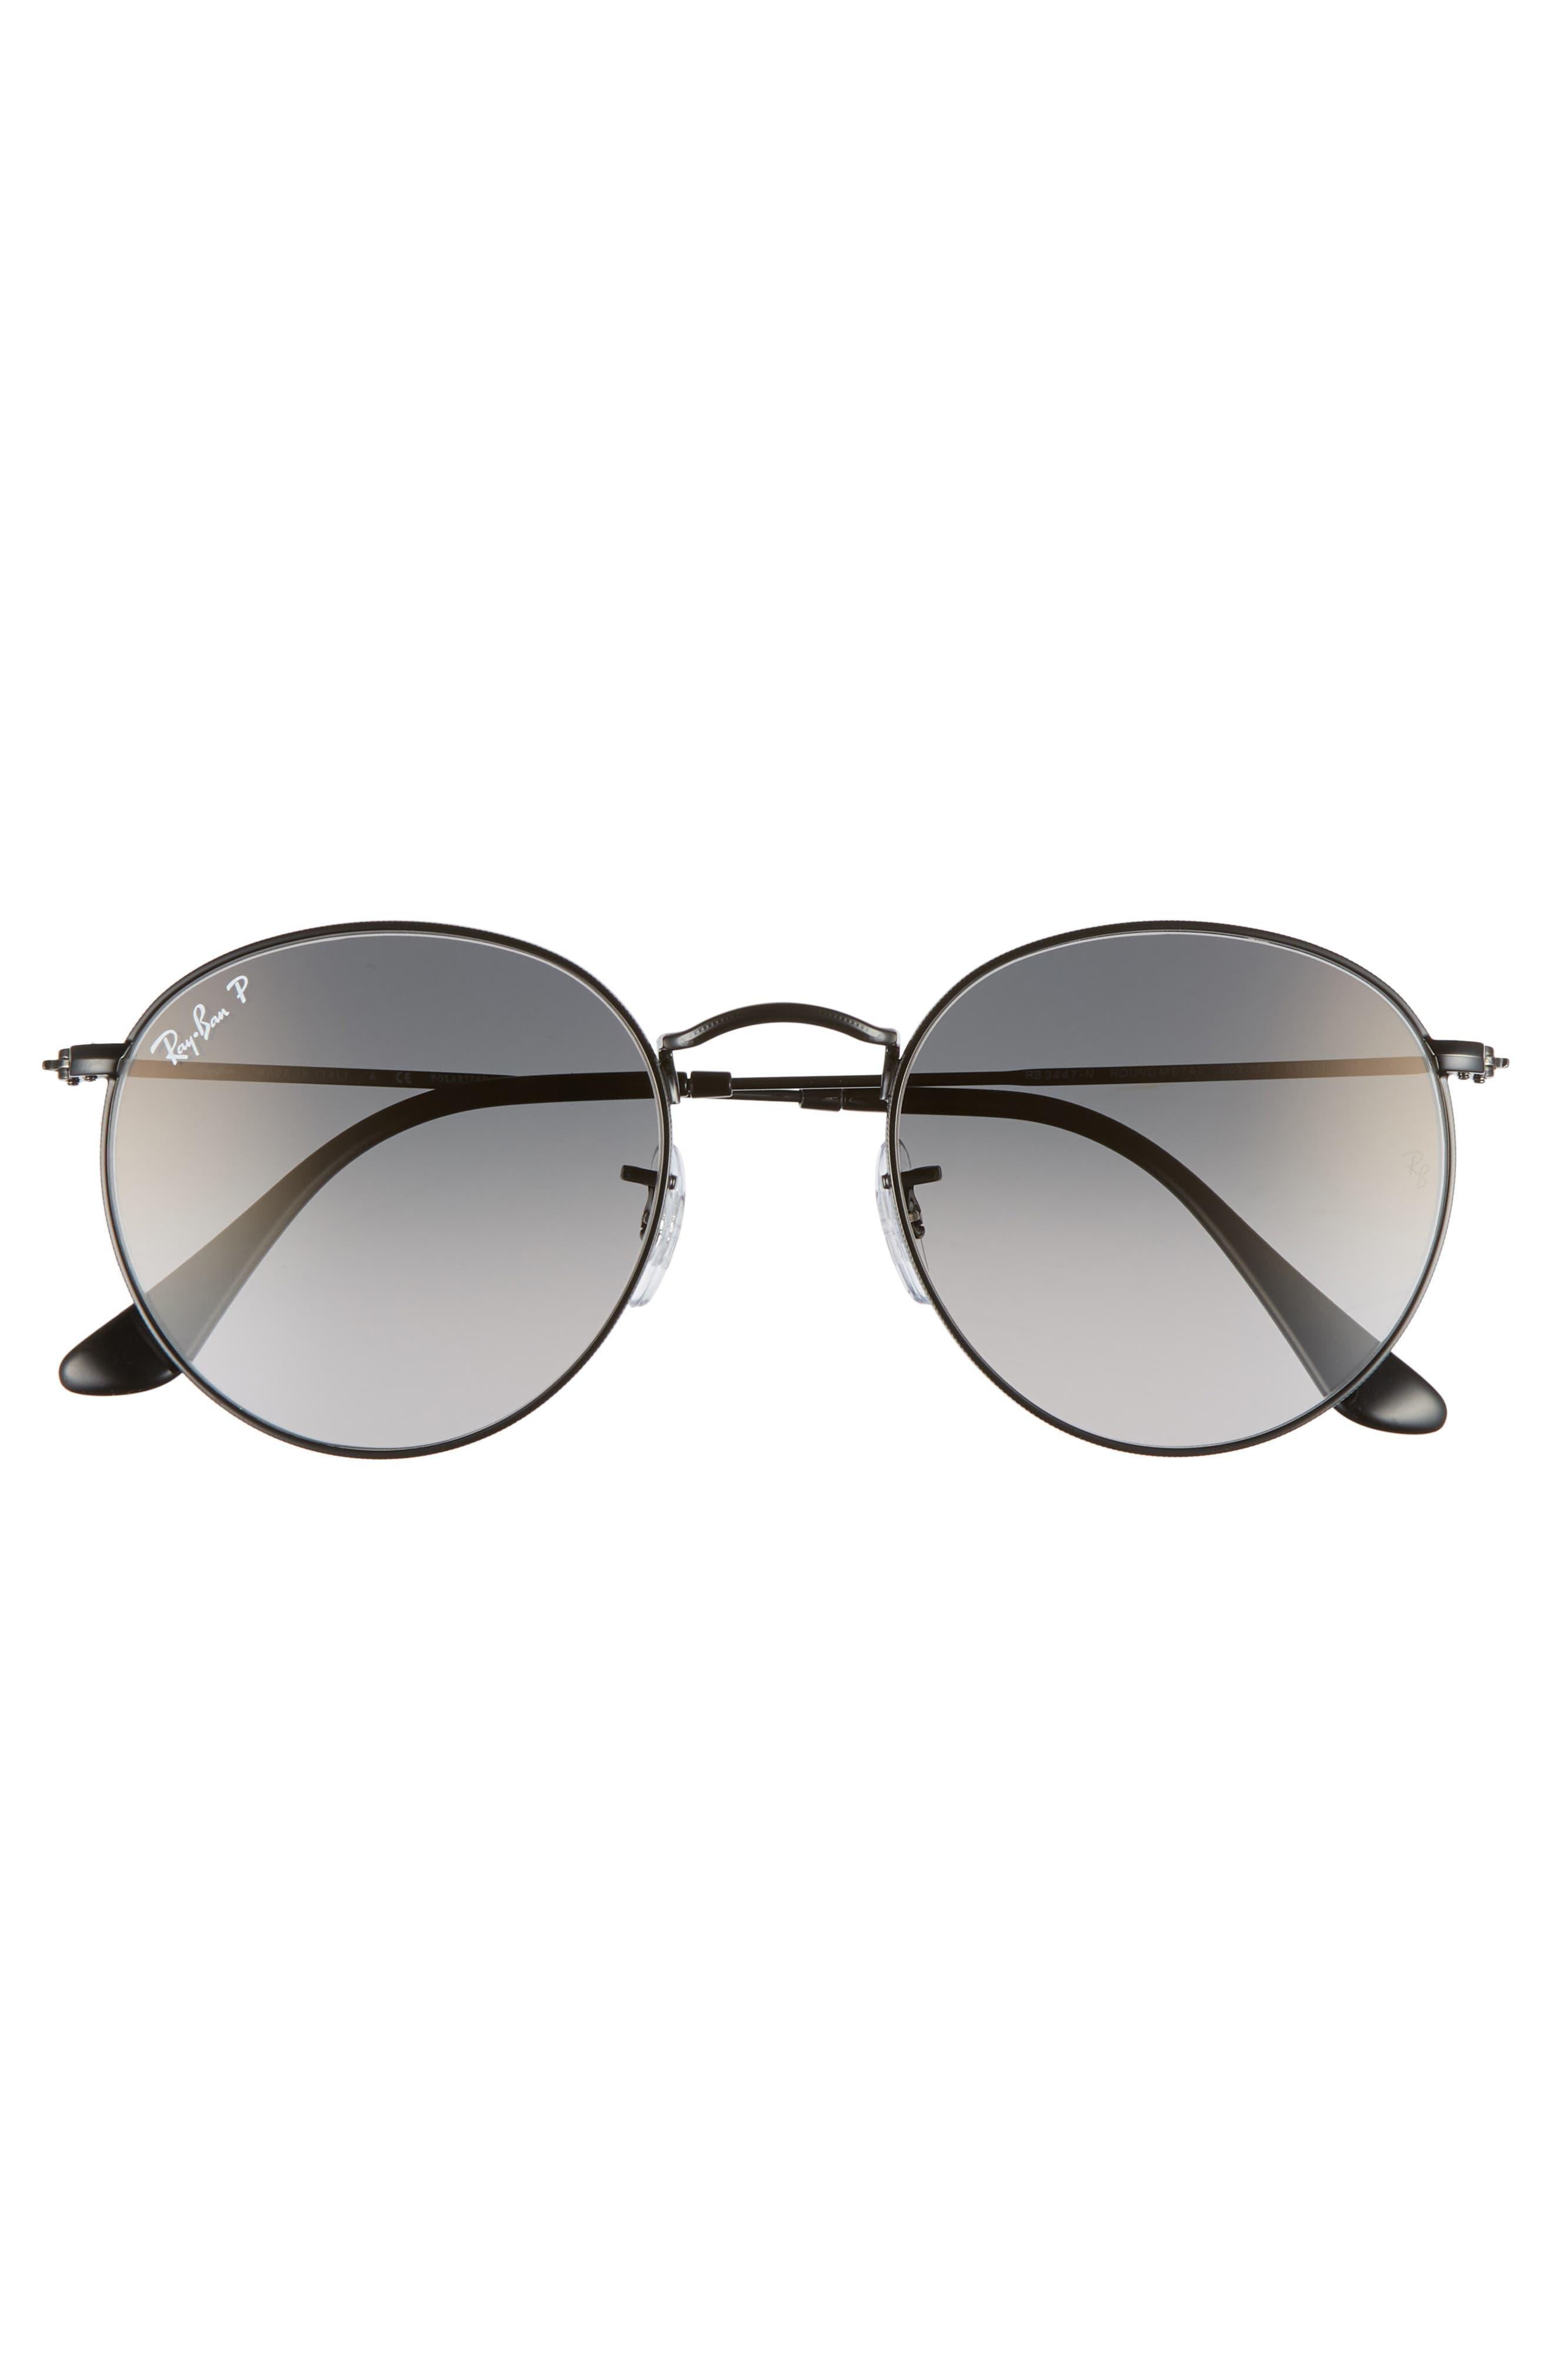 53mm Polarized Round Sunglasses,                             Alternate thumbnail 3, color,                             BLACK GRADIENT